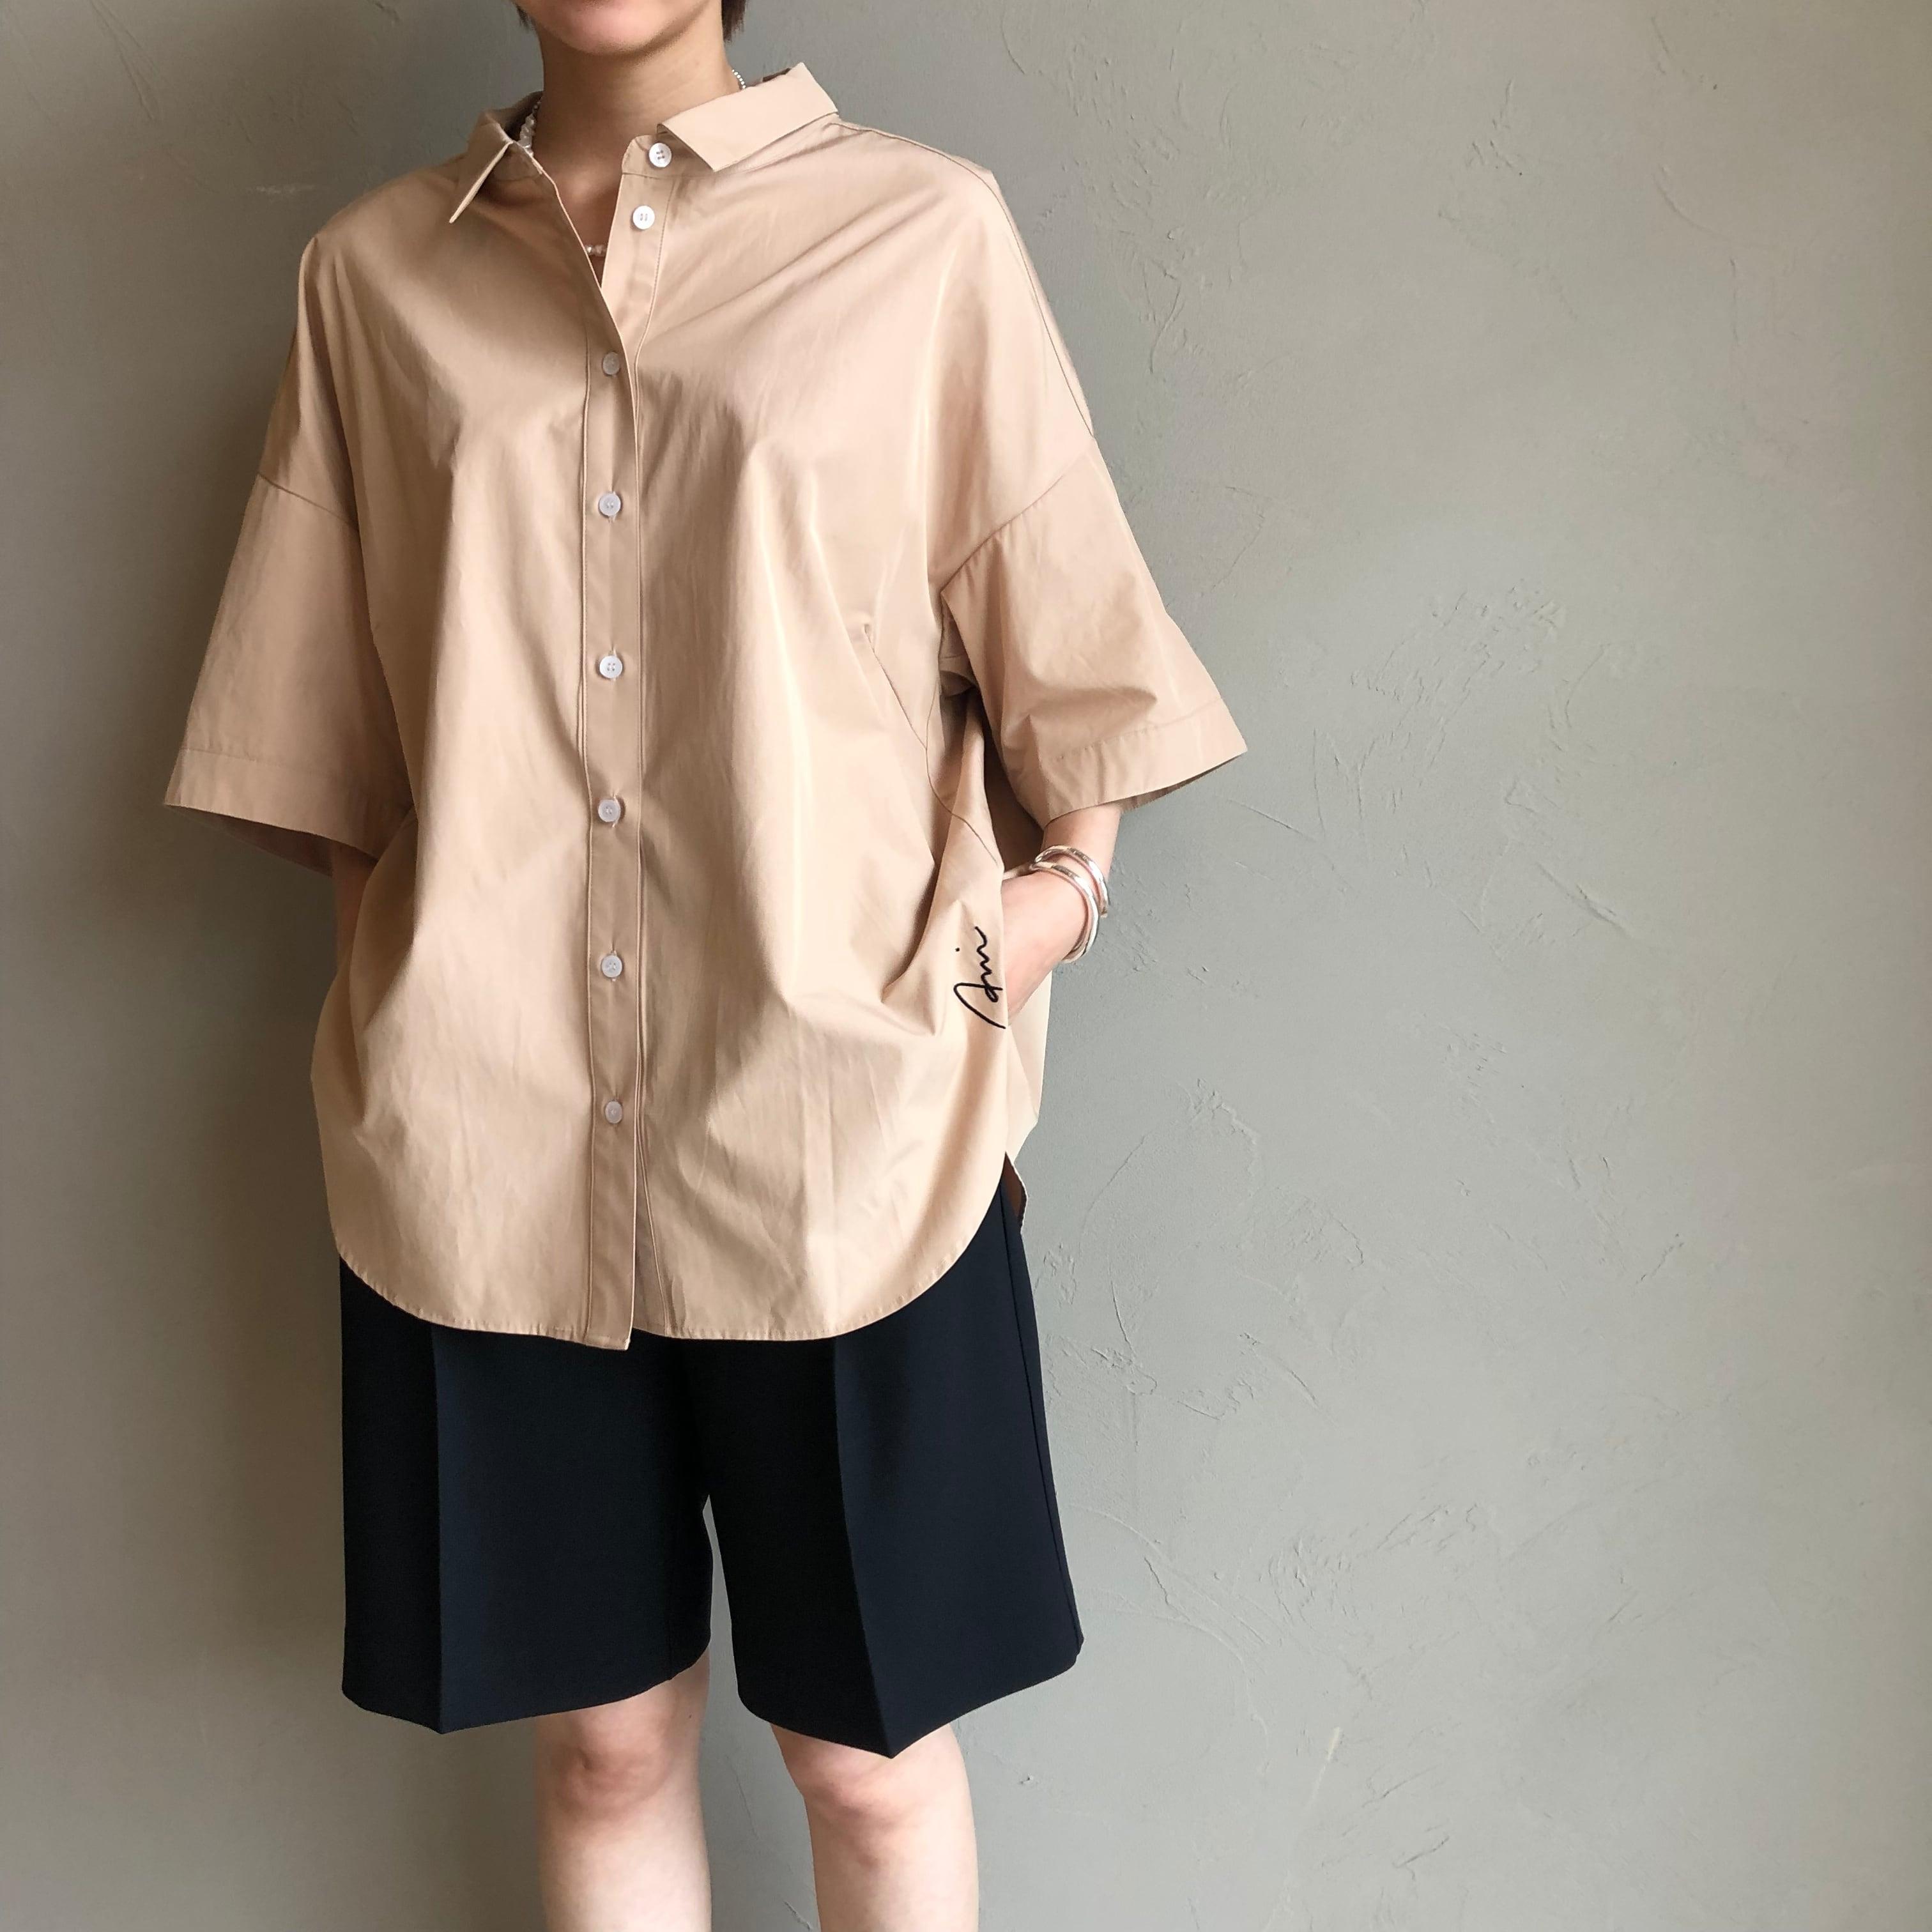 ご予約受付中!7/16〜発送予定【 ANIECA 】Embroidery Shirts